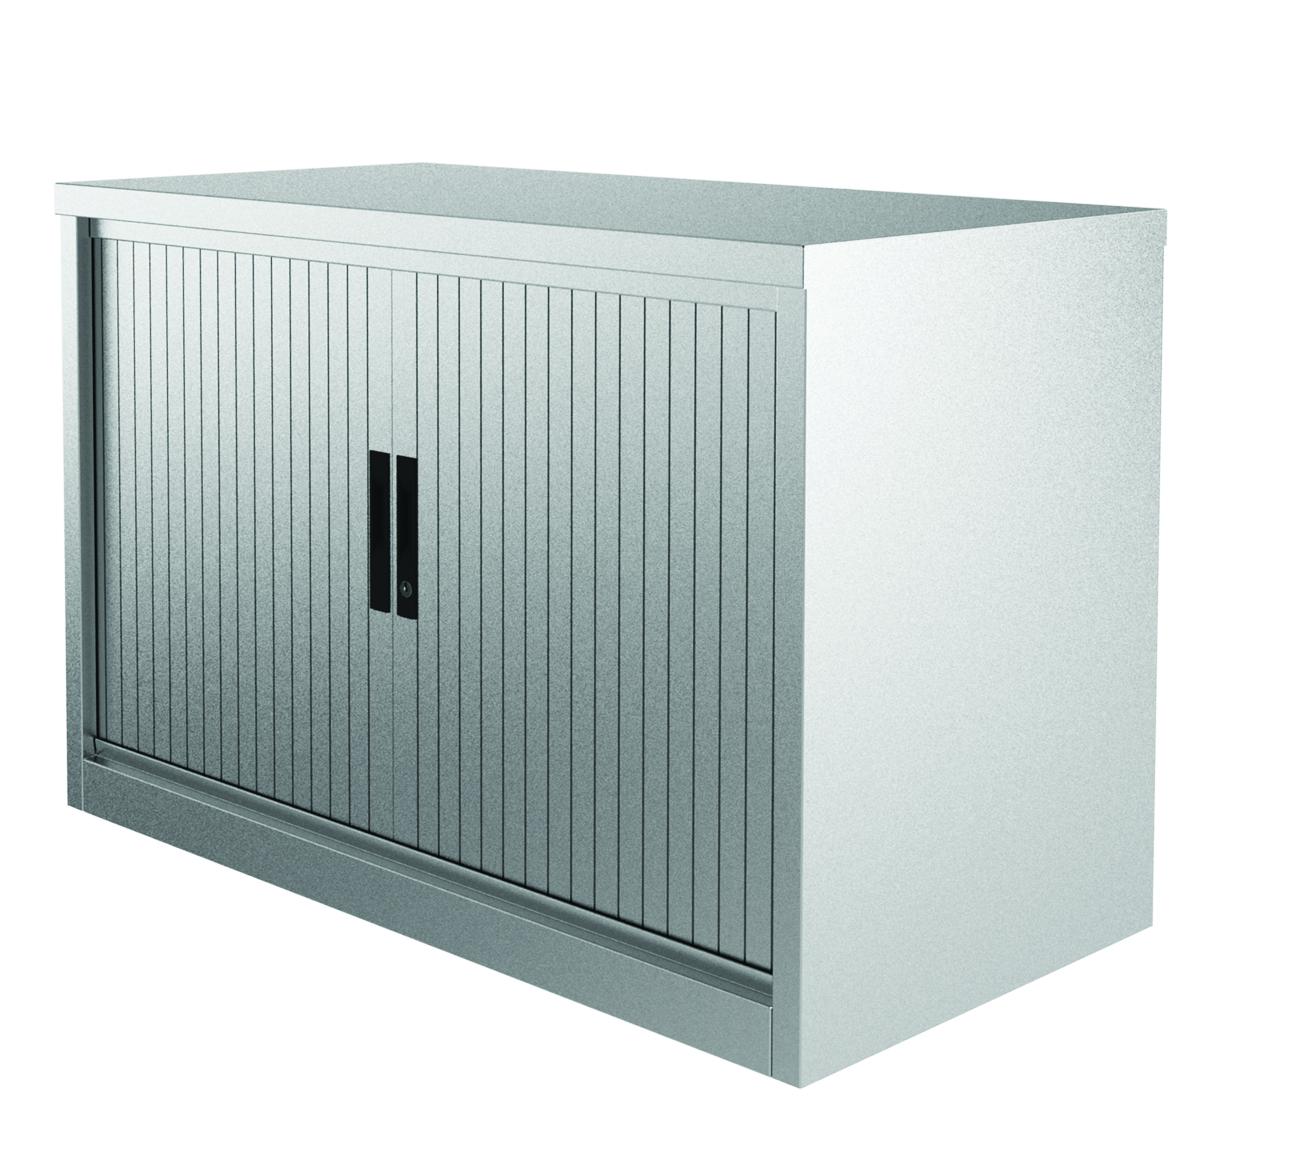 Kontrax - Side Tambour Lockable Office Storage (Horizontal)